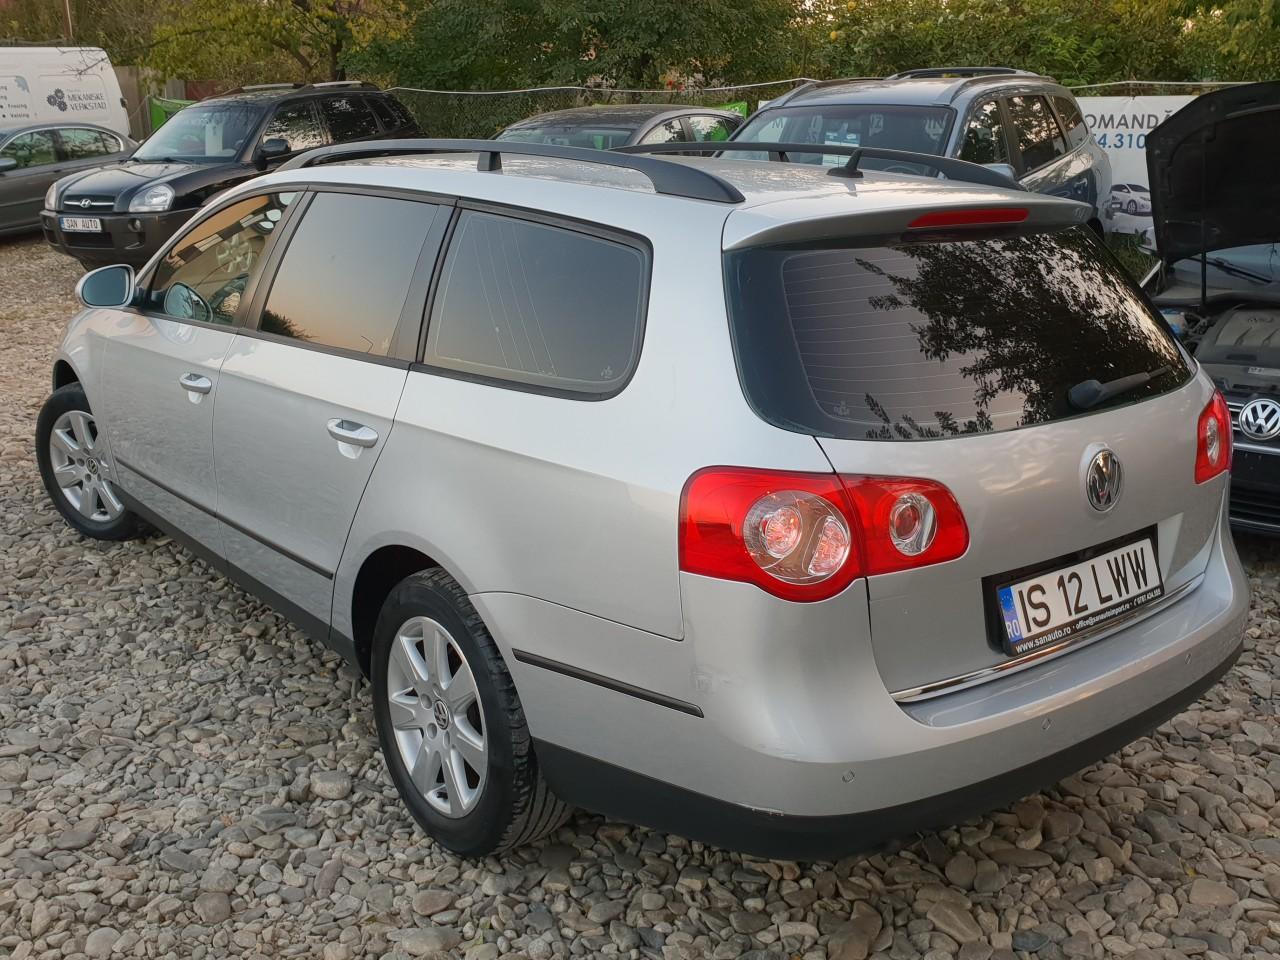 VW Passat 2.0 TDI 2006